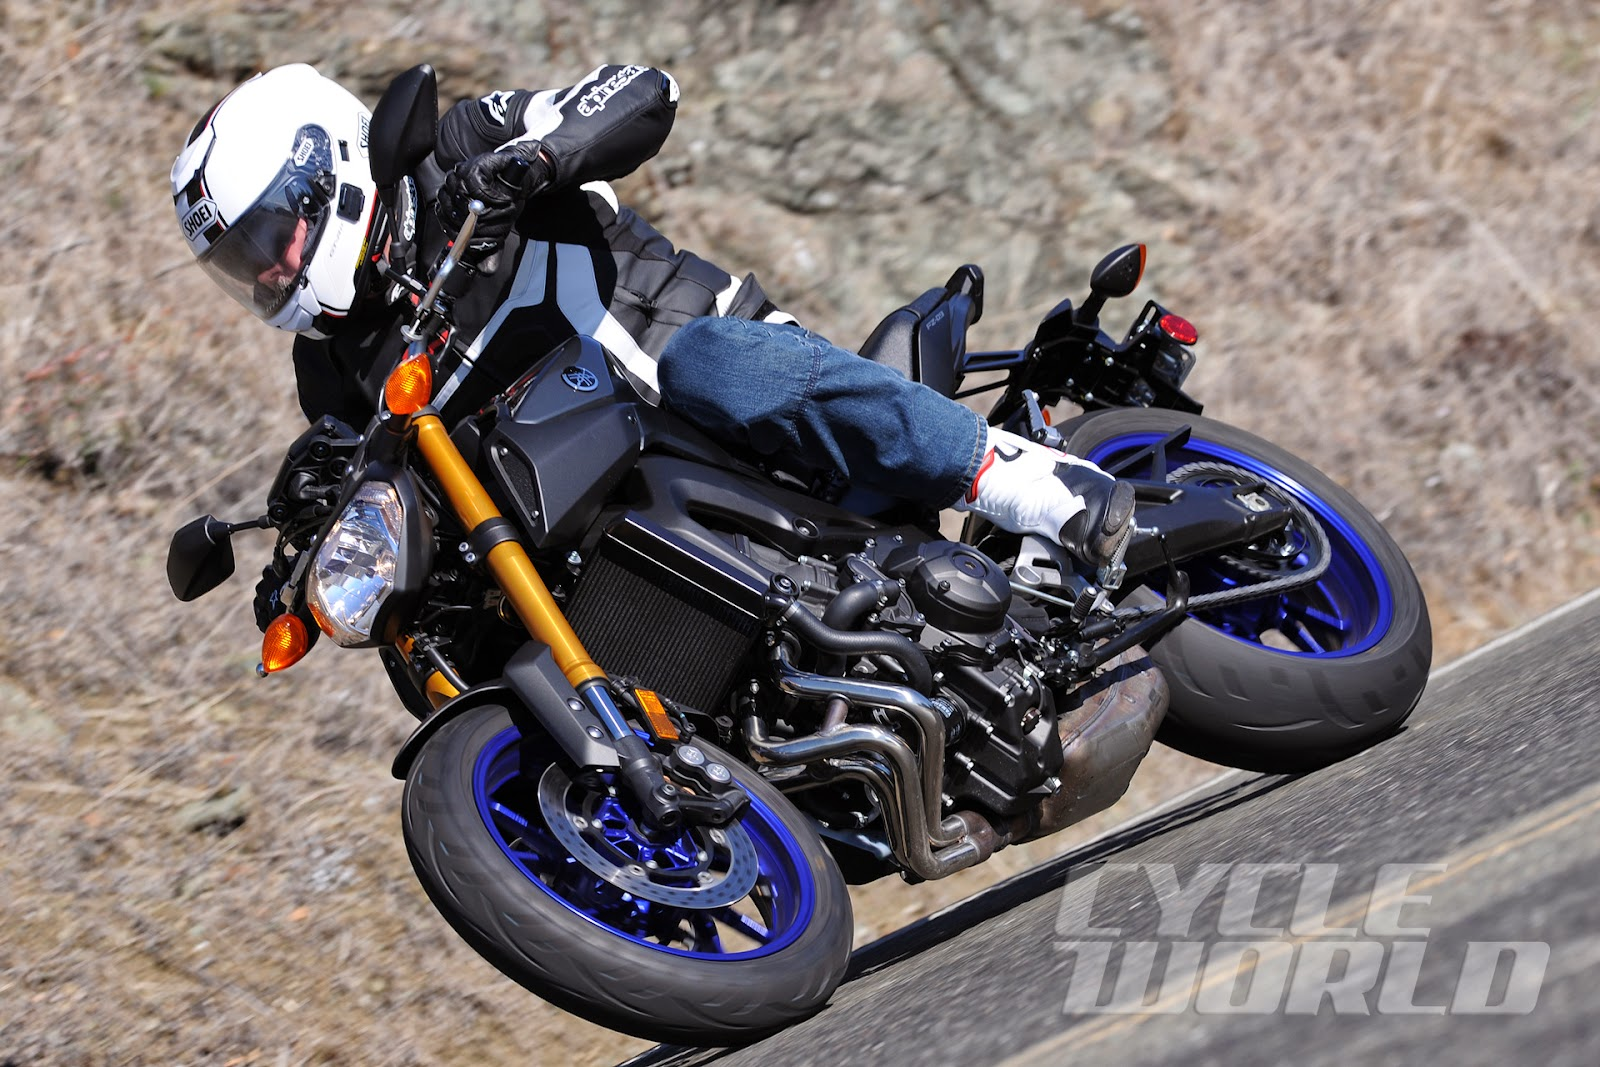 2014 yamaha fz 09 first ride for Yamaha fz09 specs